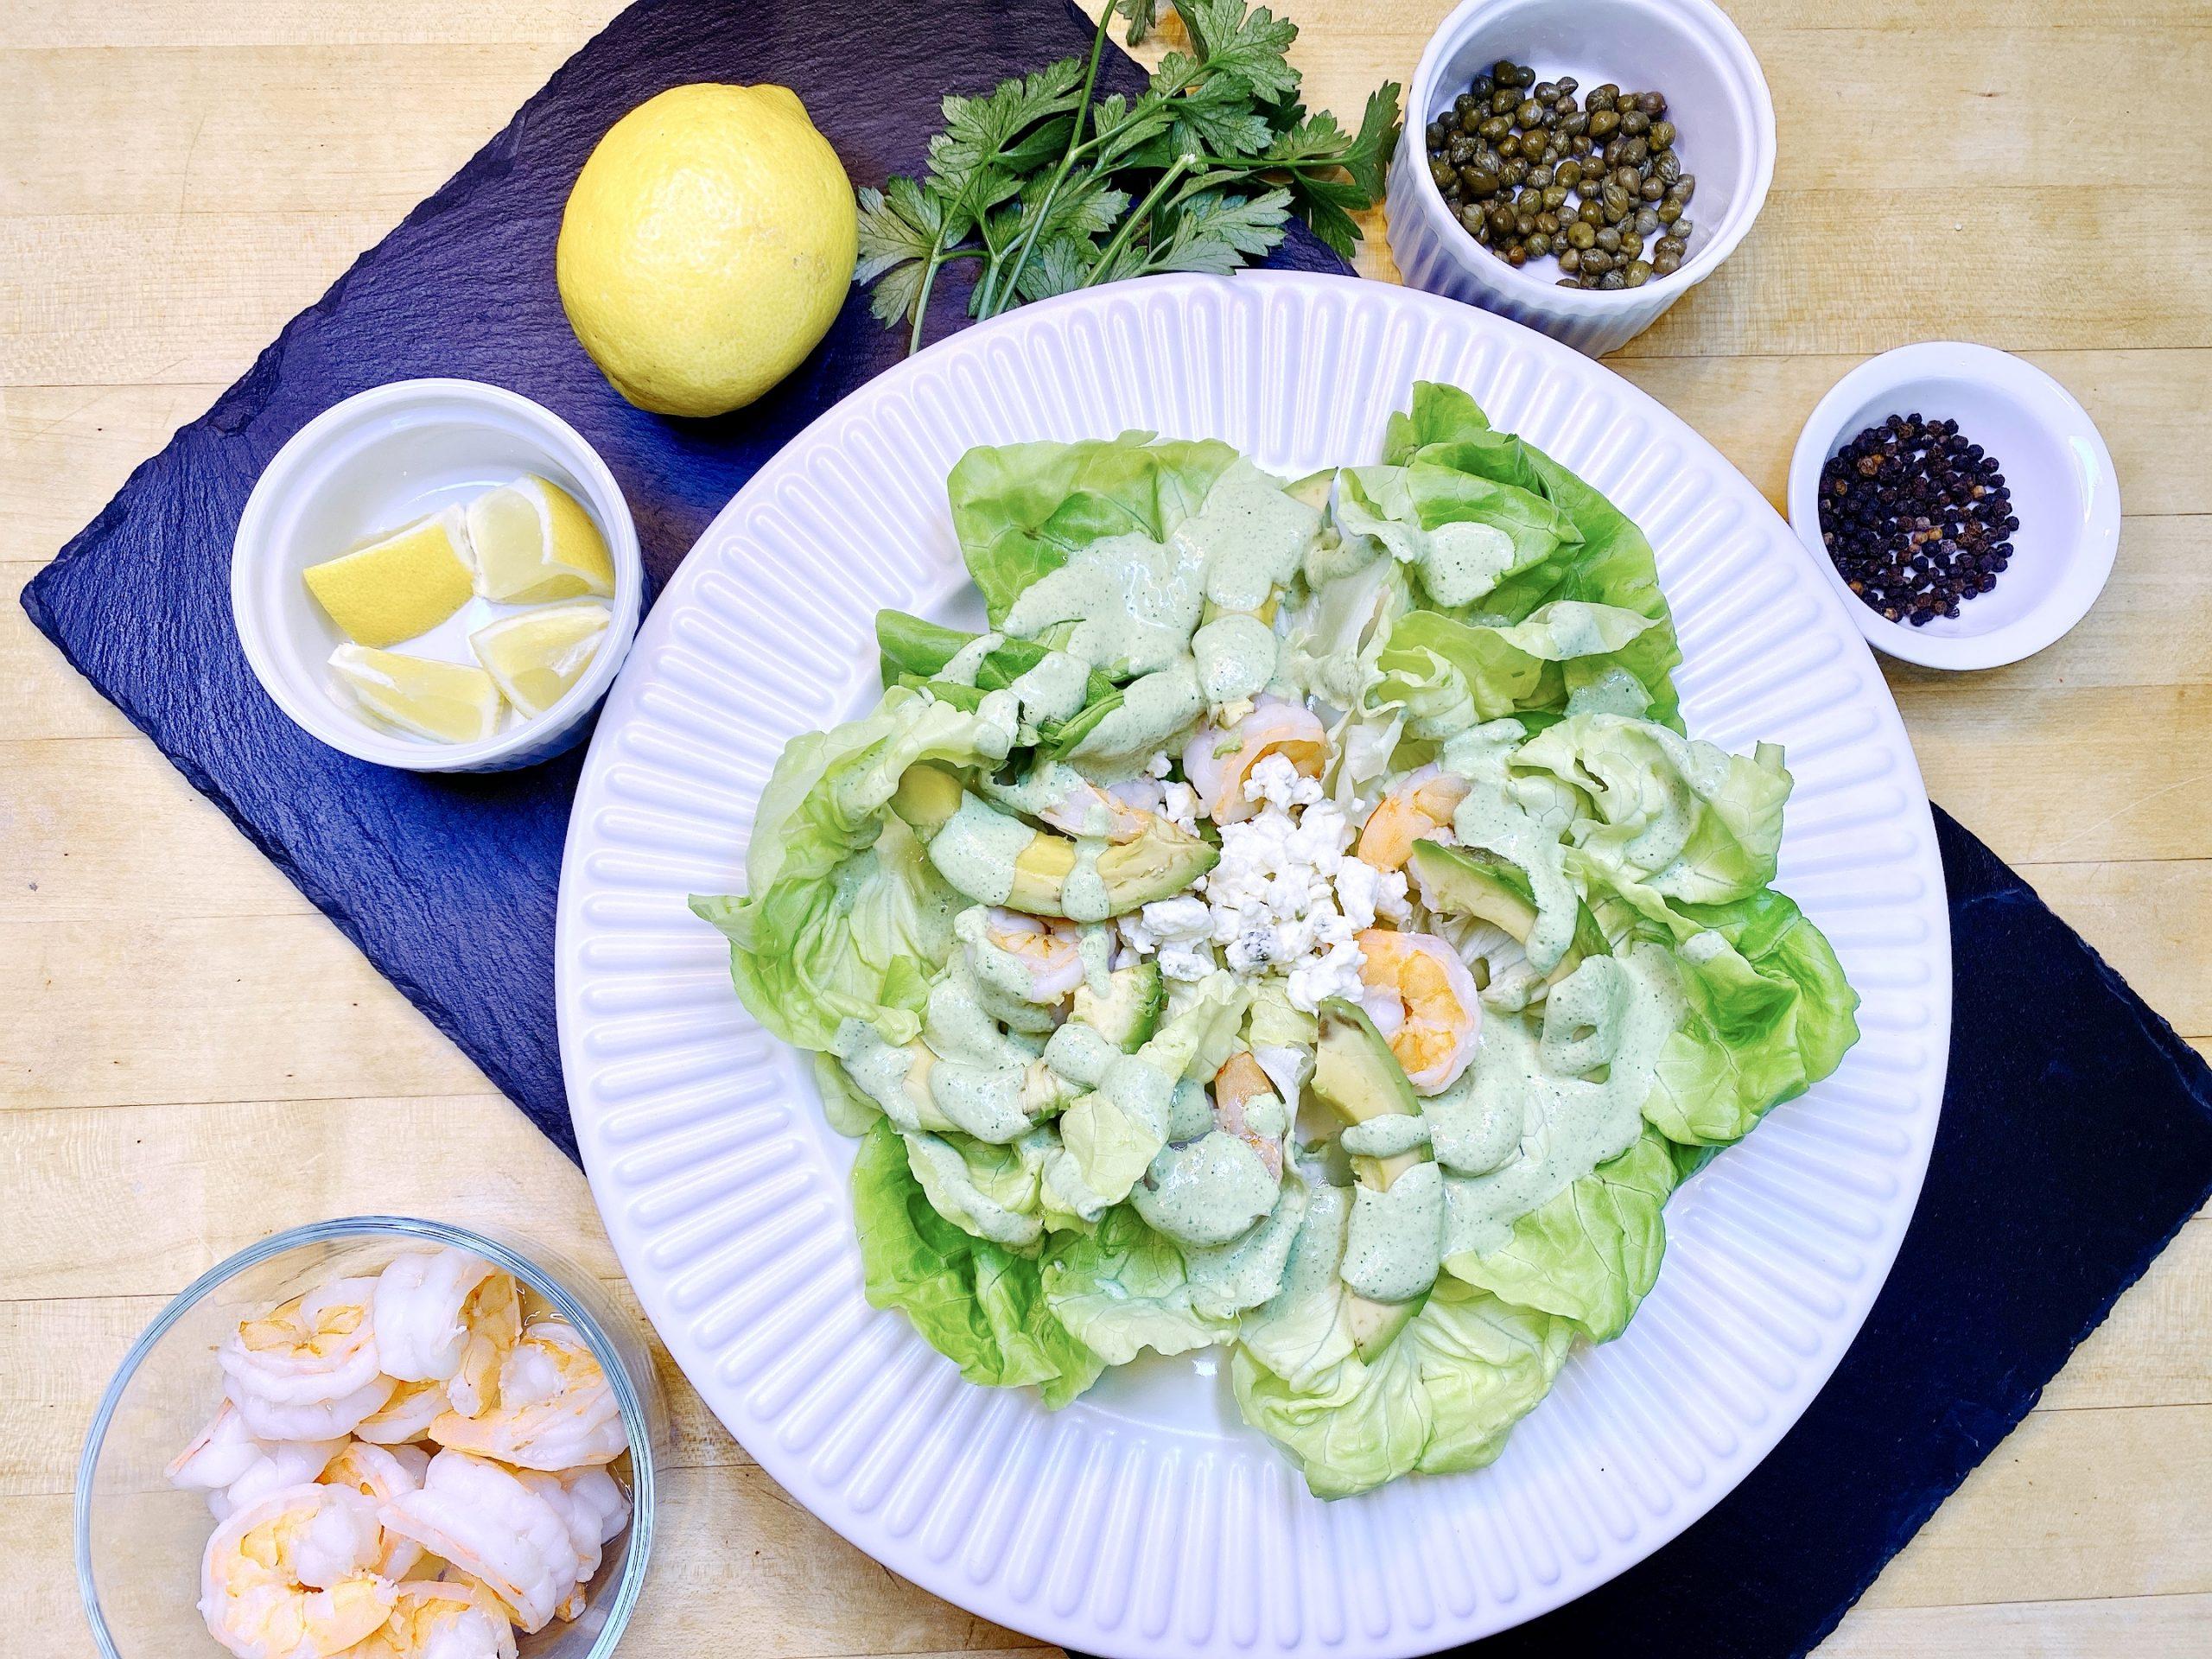 Green Goddess Dressing recipe on Shrimp Salad